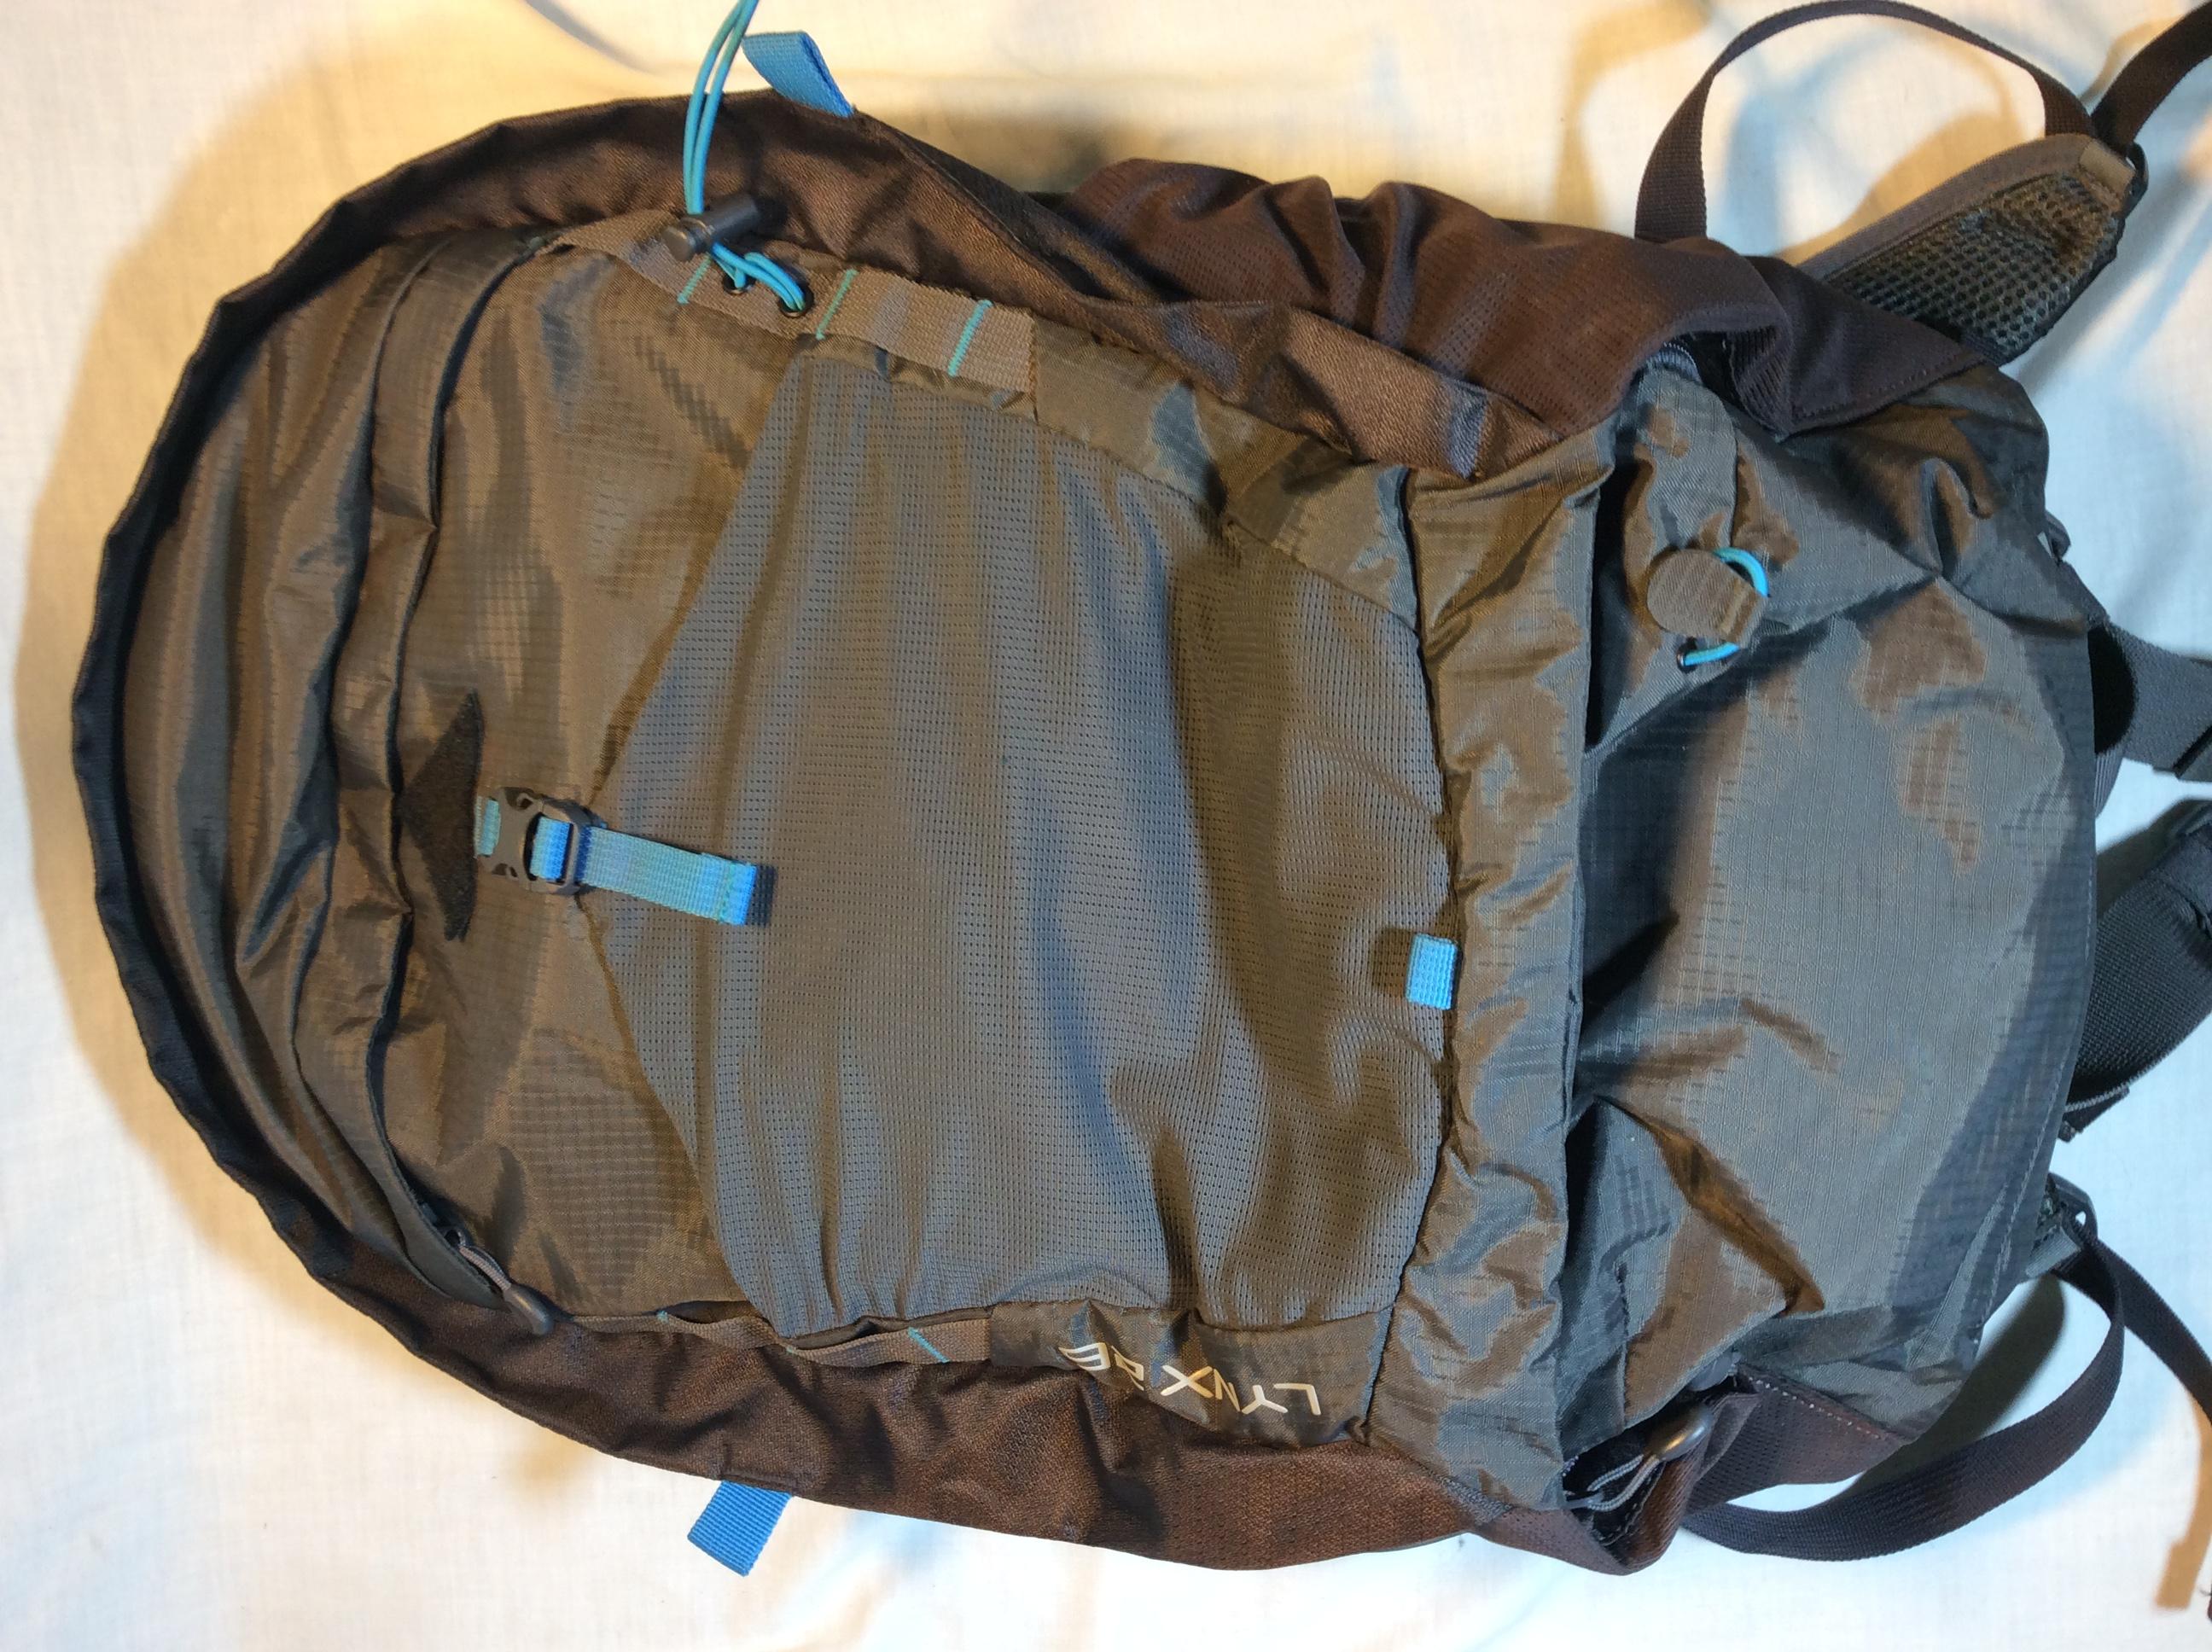 Vent Lynx 28 backpack